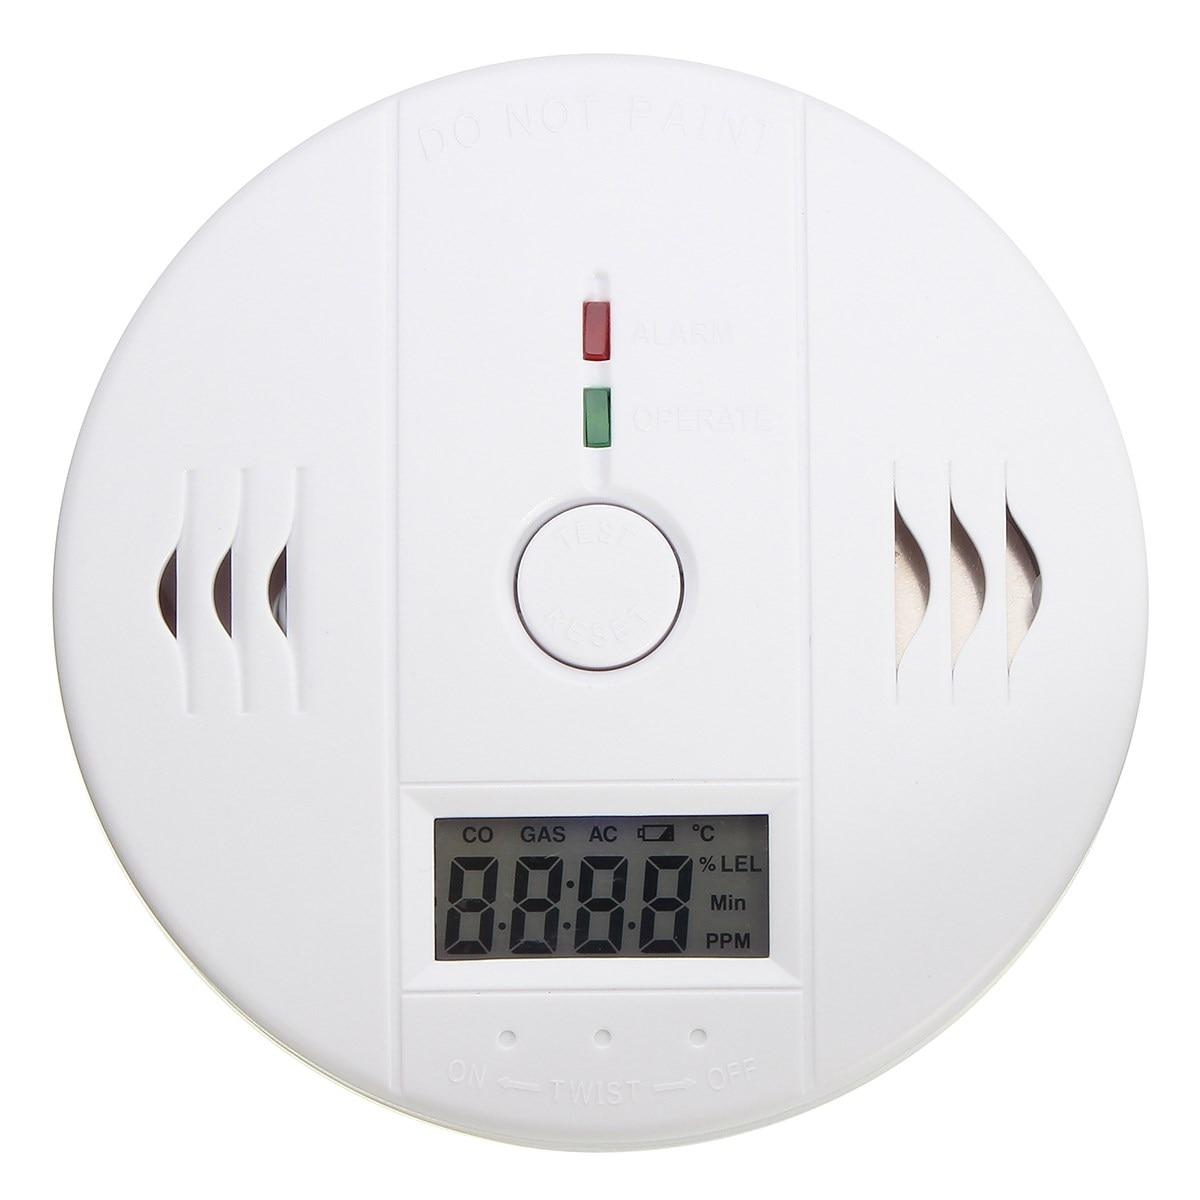 NEW LCD CO Carbon Monoxide Smoke Alarm Detector Poisoning Gas Warning Sensor Tester High Sensitive smoke alarm gas detector audio sound high fidelity sensitive monitor microphone